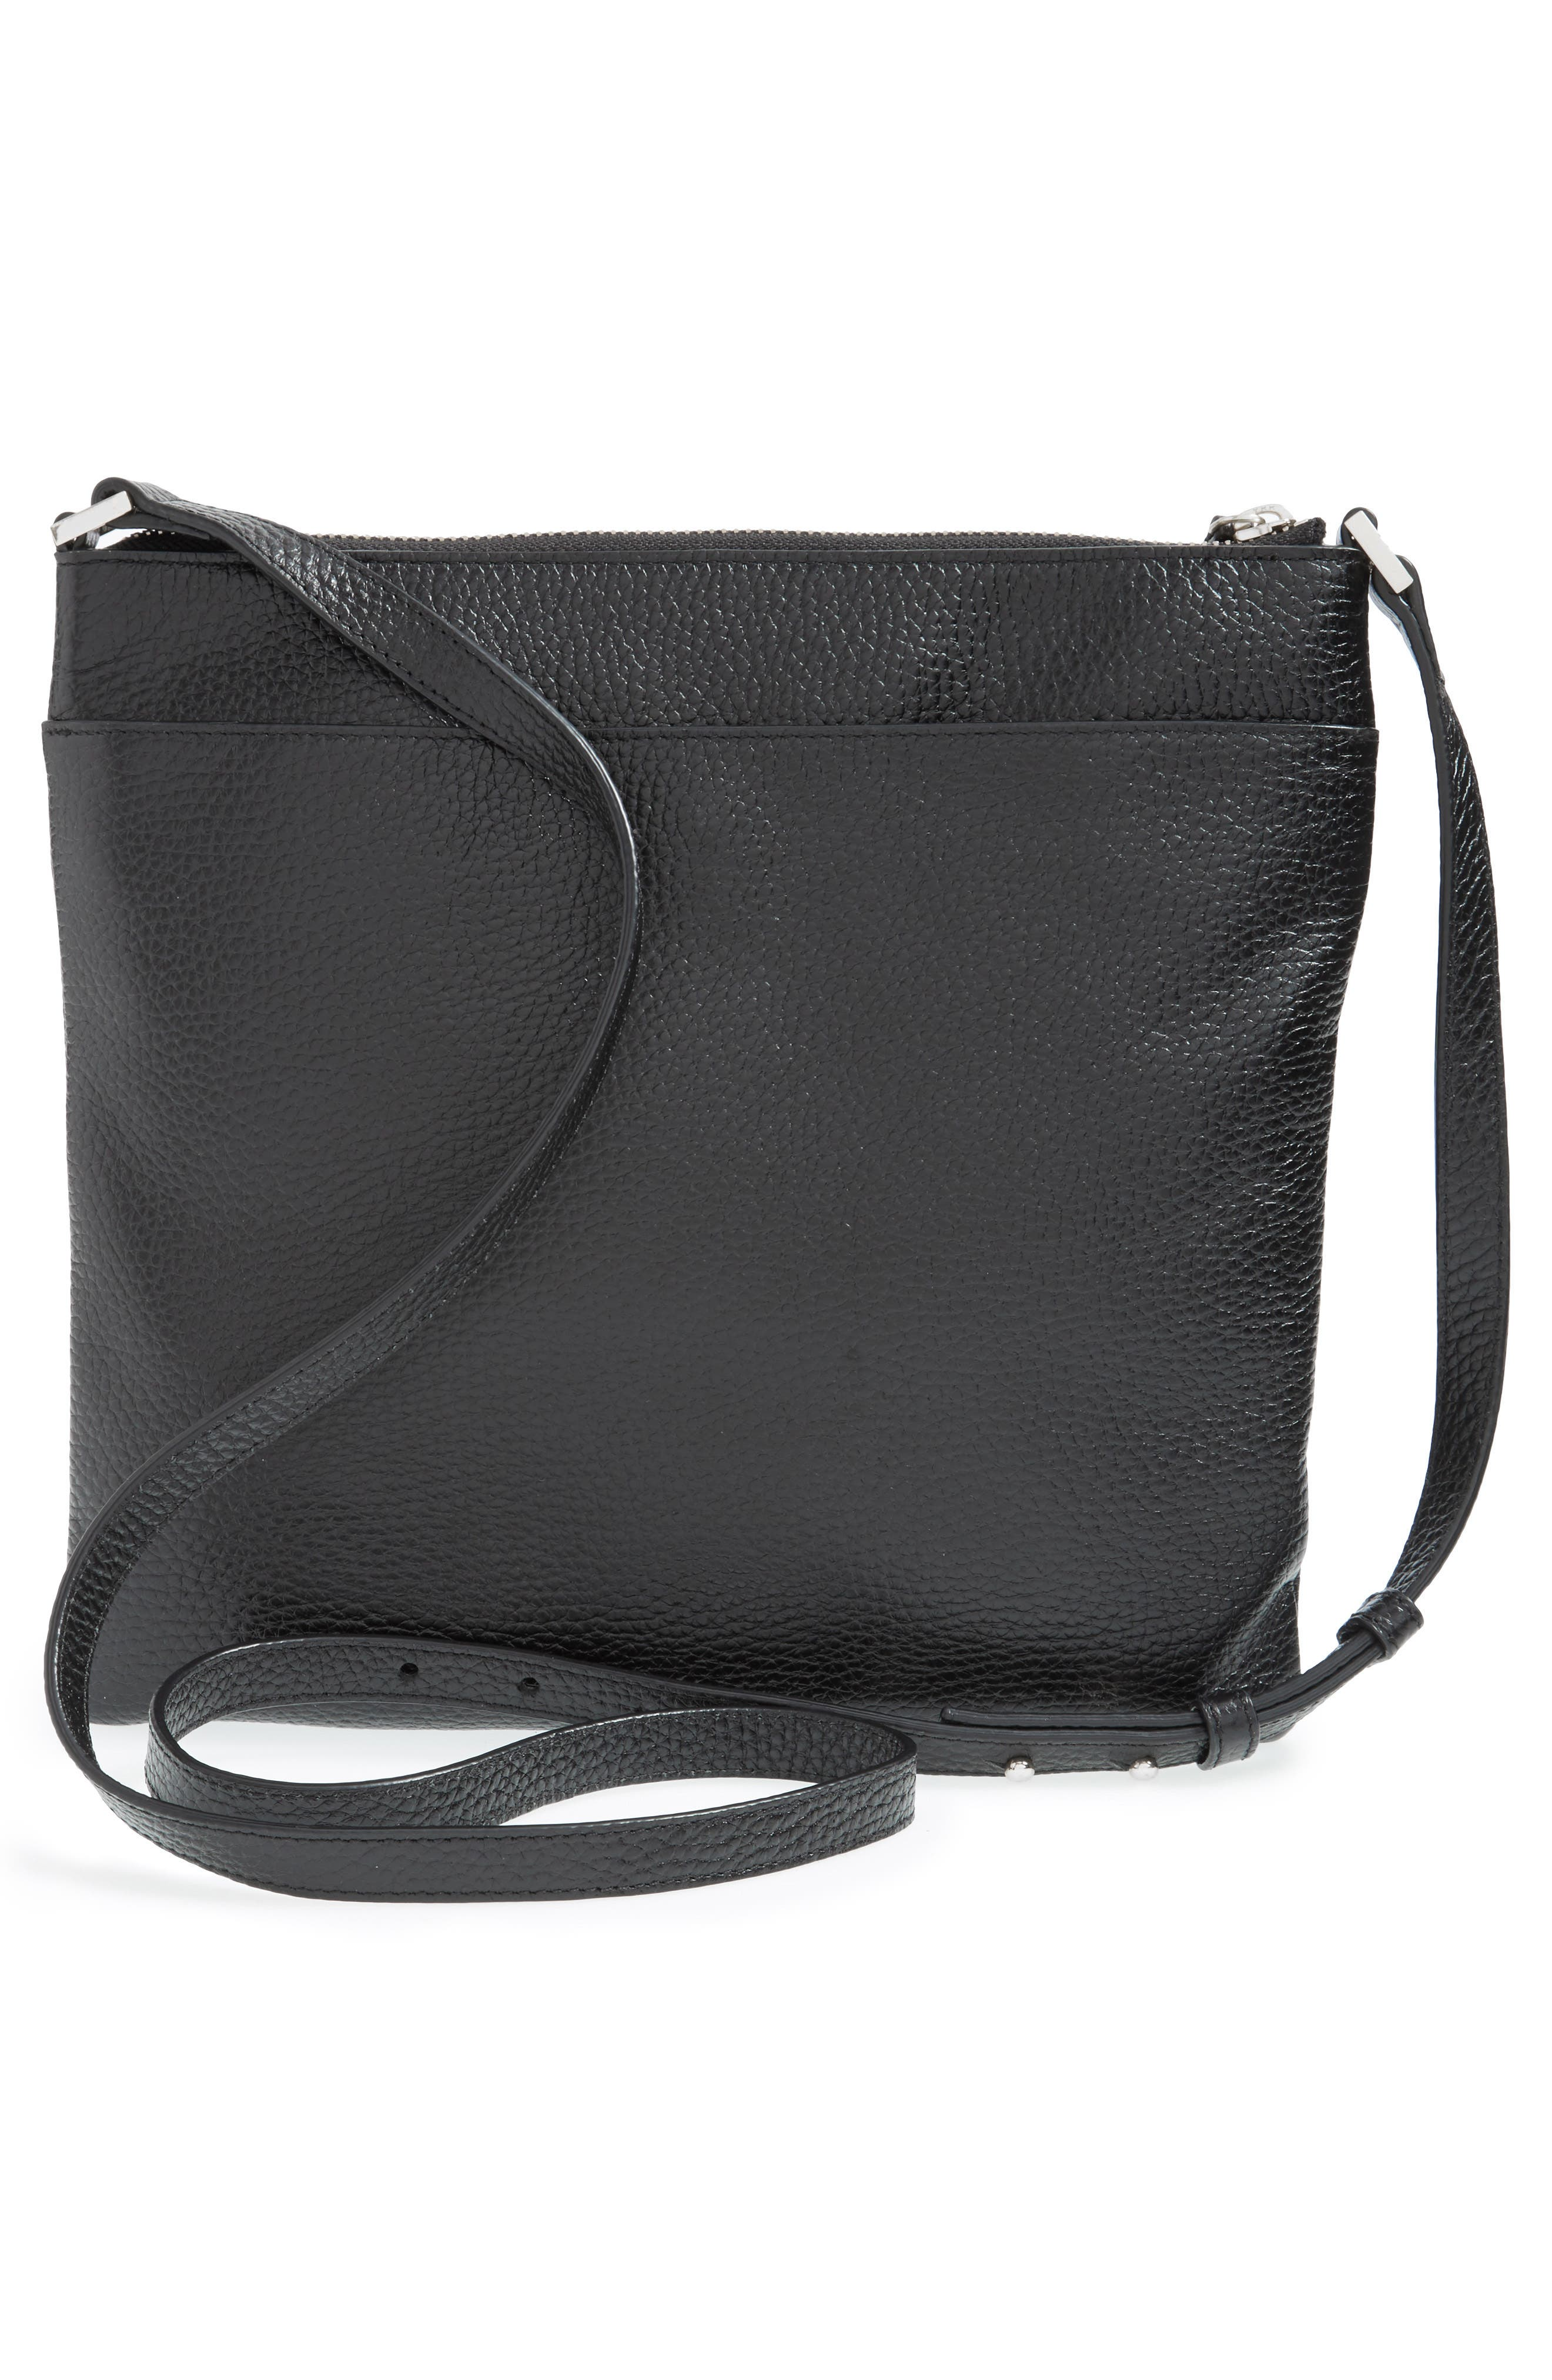 HALOGEN<SUP>®</SUP>, Tasseled Leather Crossbody Bag, Alternate thumbnail 4, color, 001